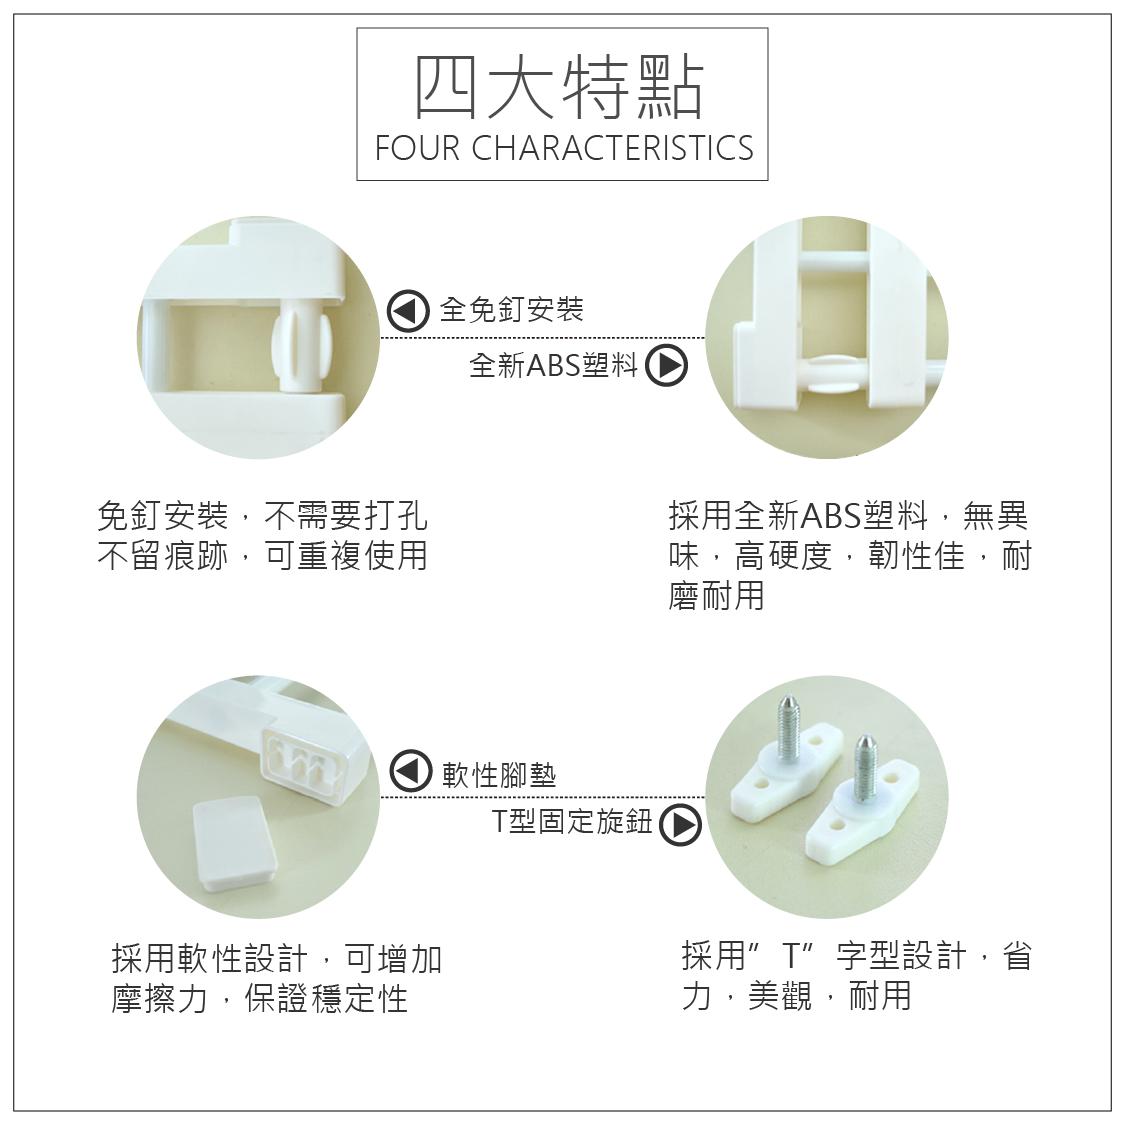 EC002 多功能伸縮隔板 易利裝生活五金 衣櫃 小資族 置物架 收納架 層板架 2